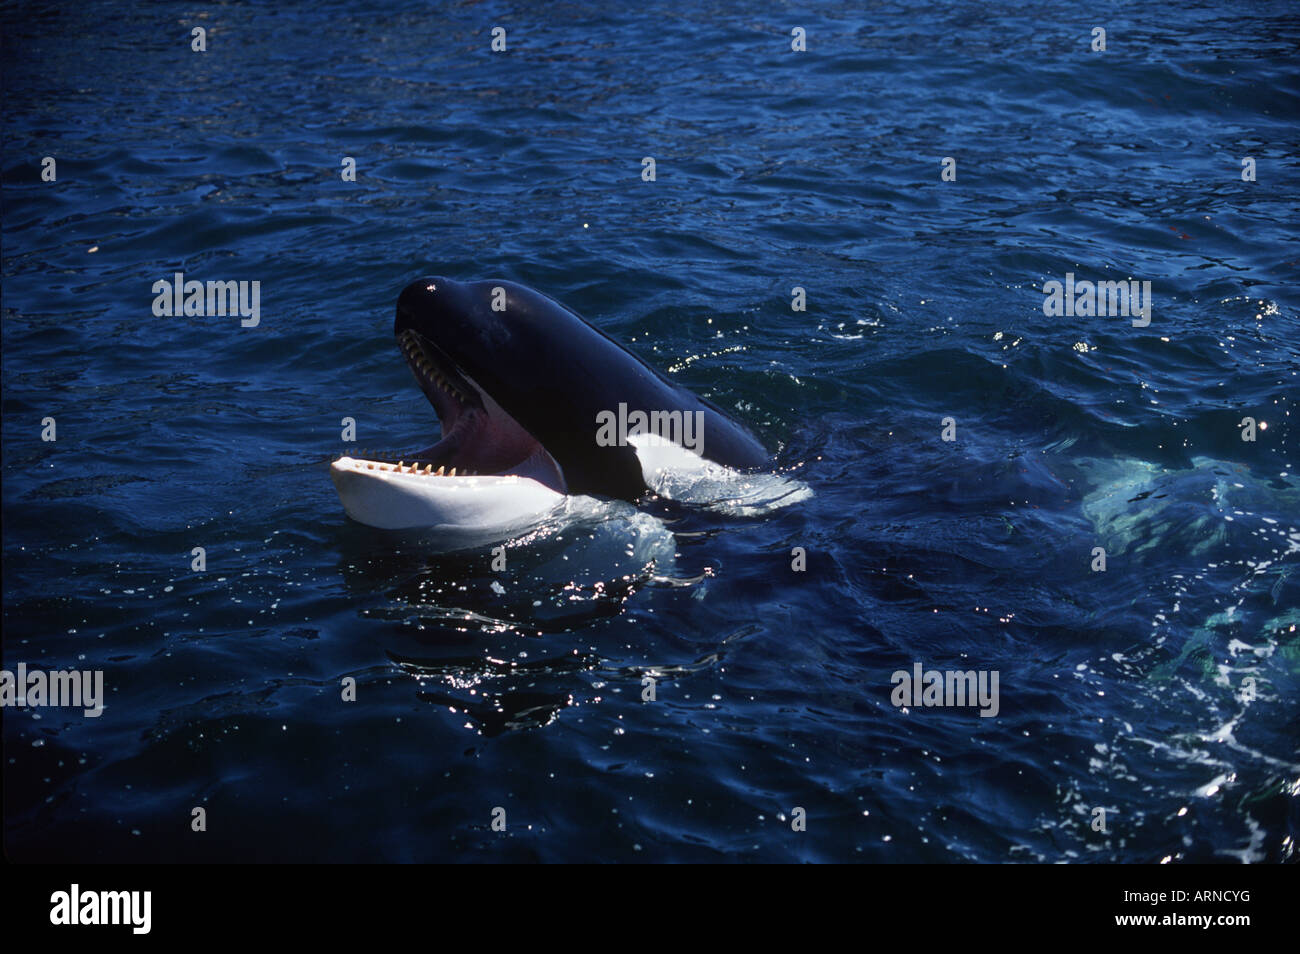 Killer whale (orcinus orca), Vancouver Island, British Columbia, Canada. Stock Photo